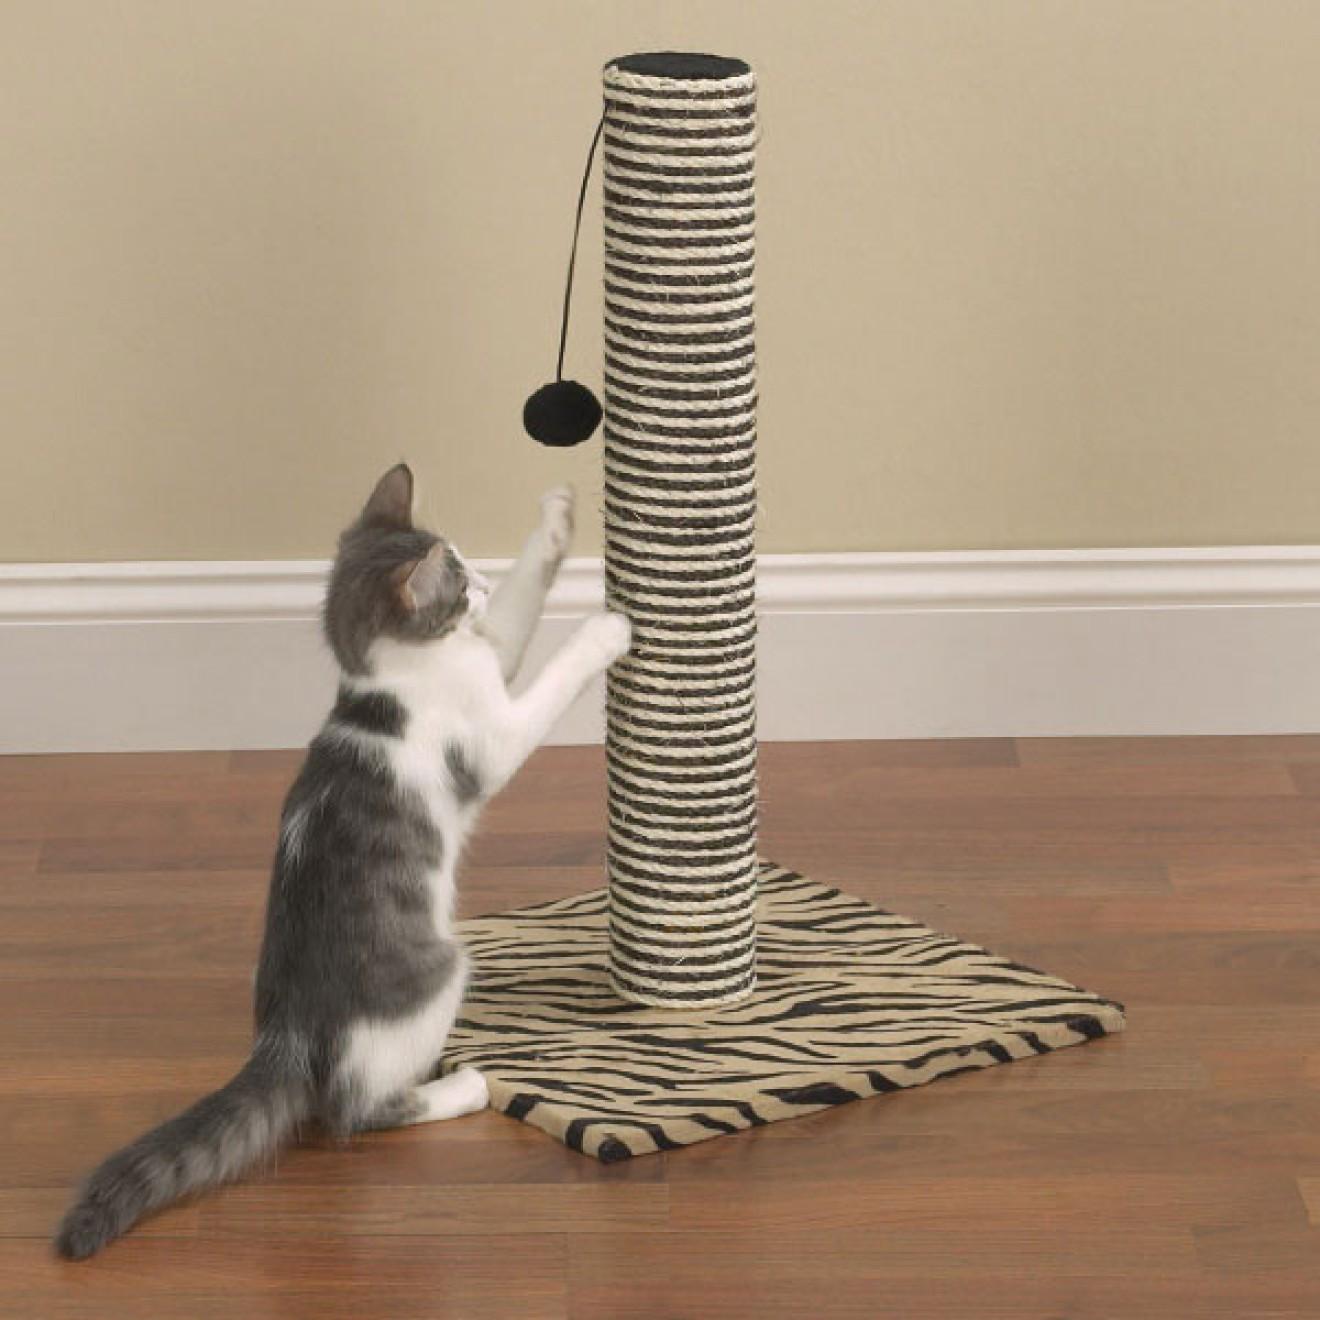 katzenkratzbaum wild thing katzenspielzeug sisal. Black Bedroom Furniture Sets. Home Design Ideas